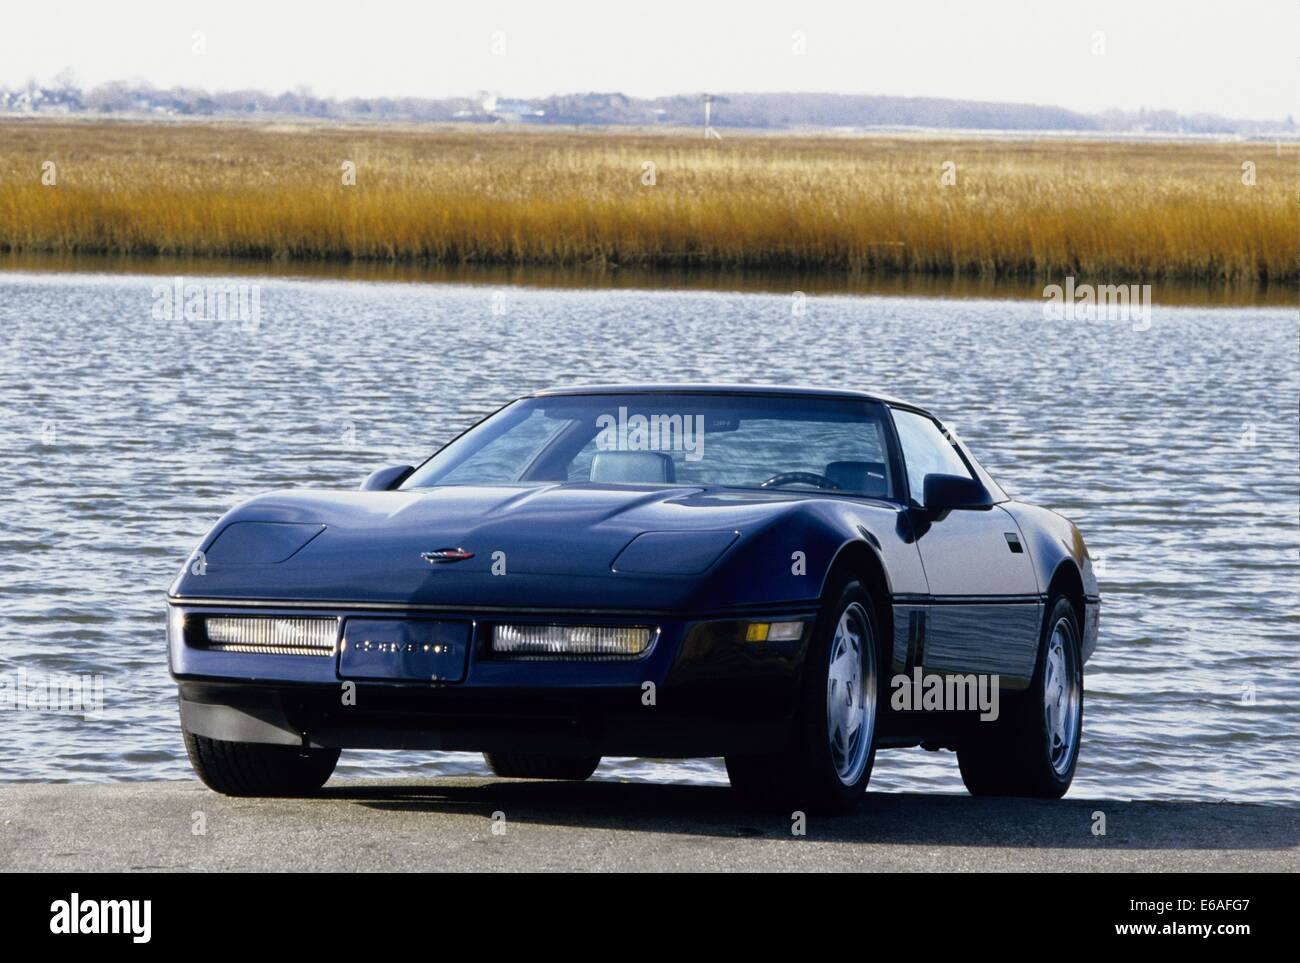 Chevrolet Corvette C4 Callaway modified version - 1988 Model